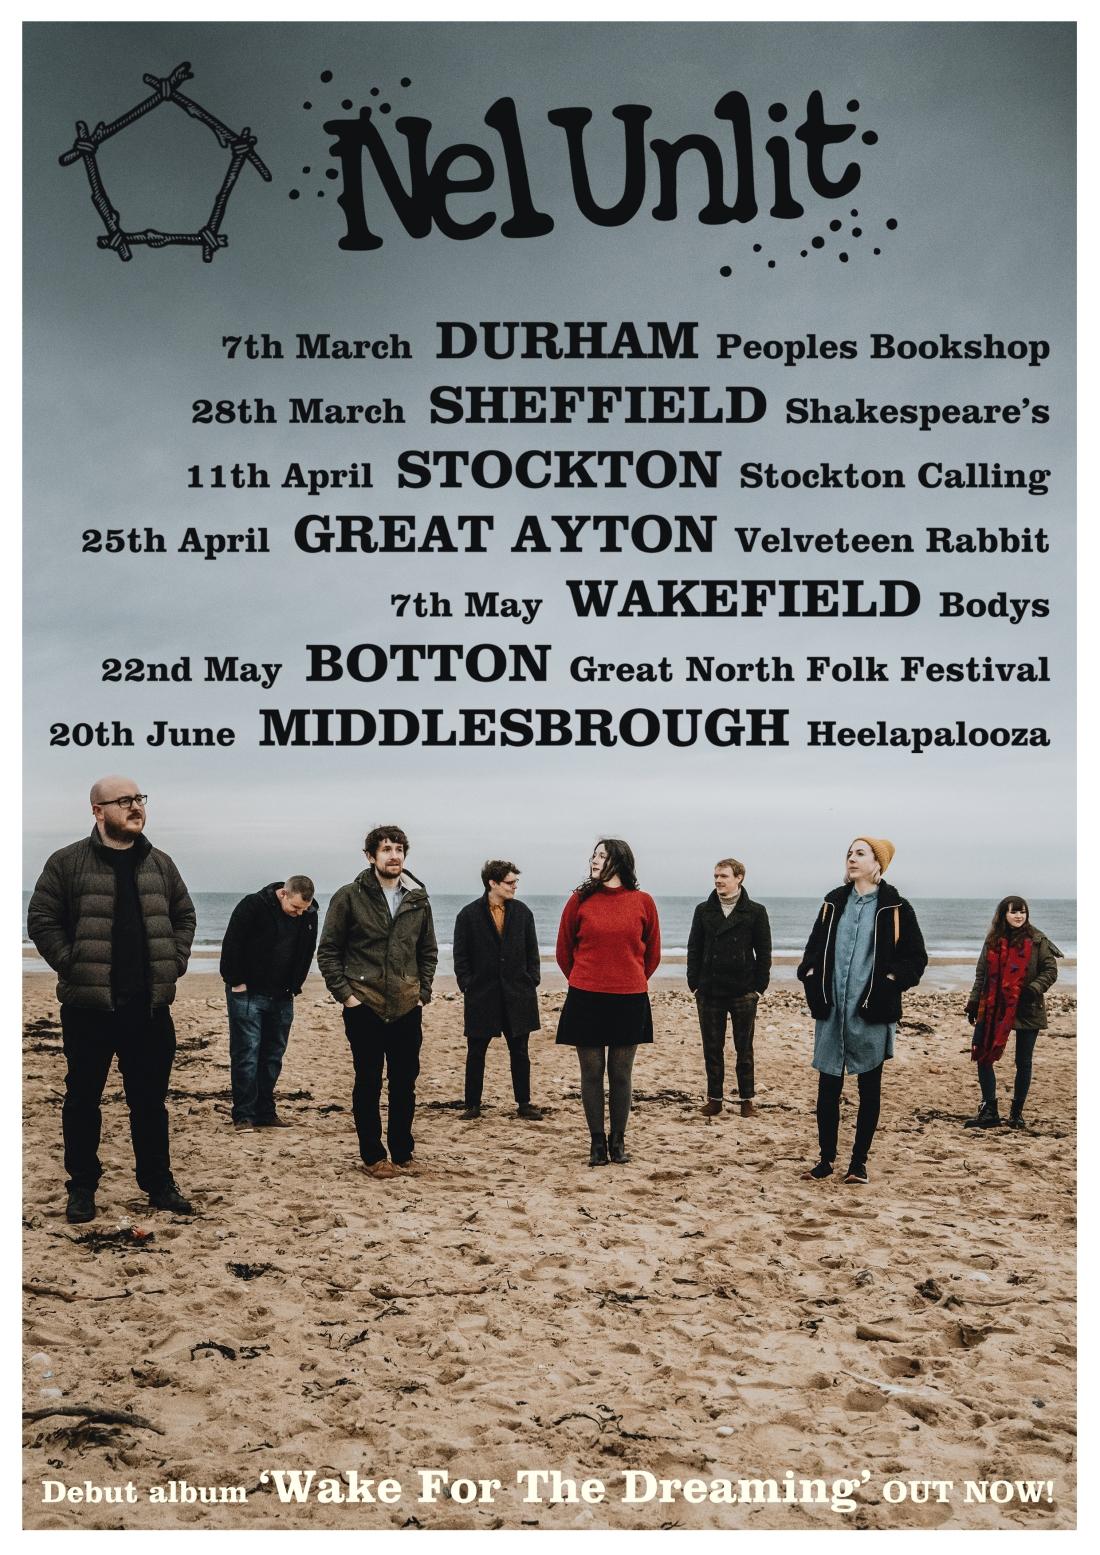 Spring tour poster